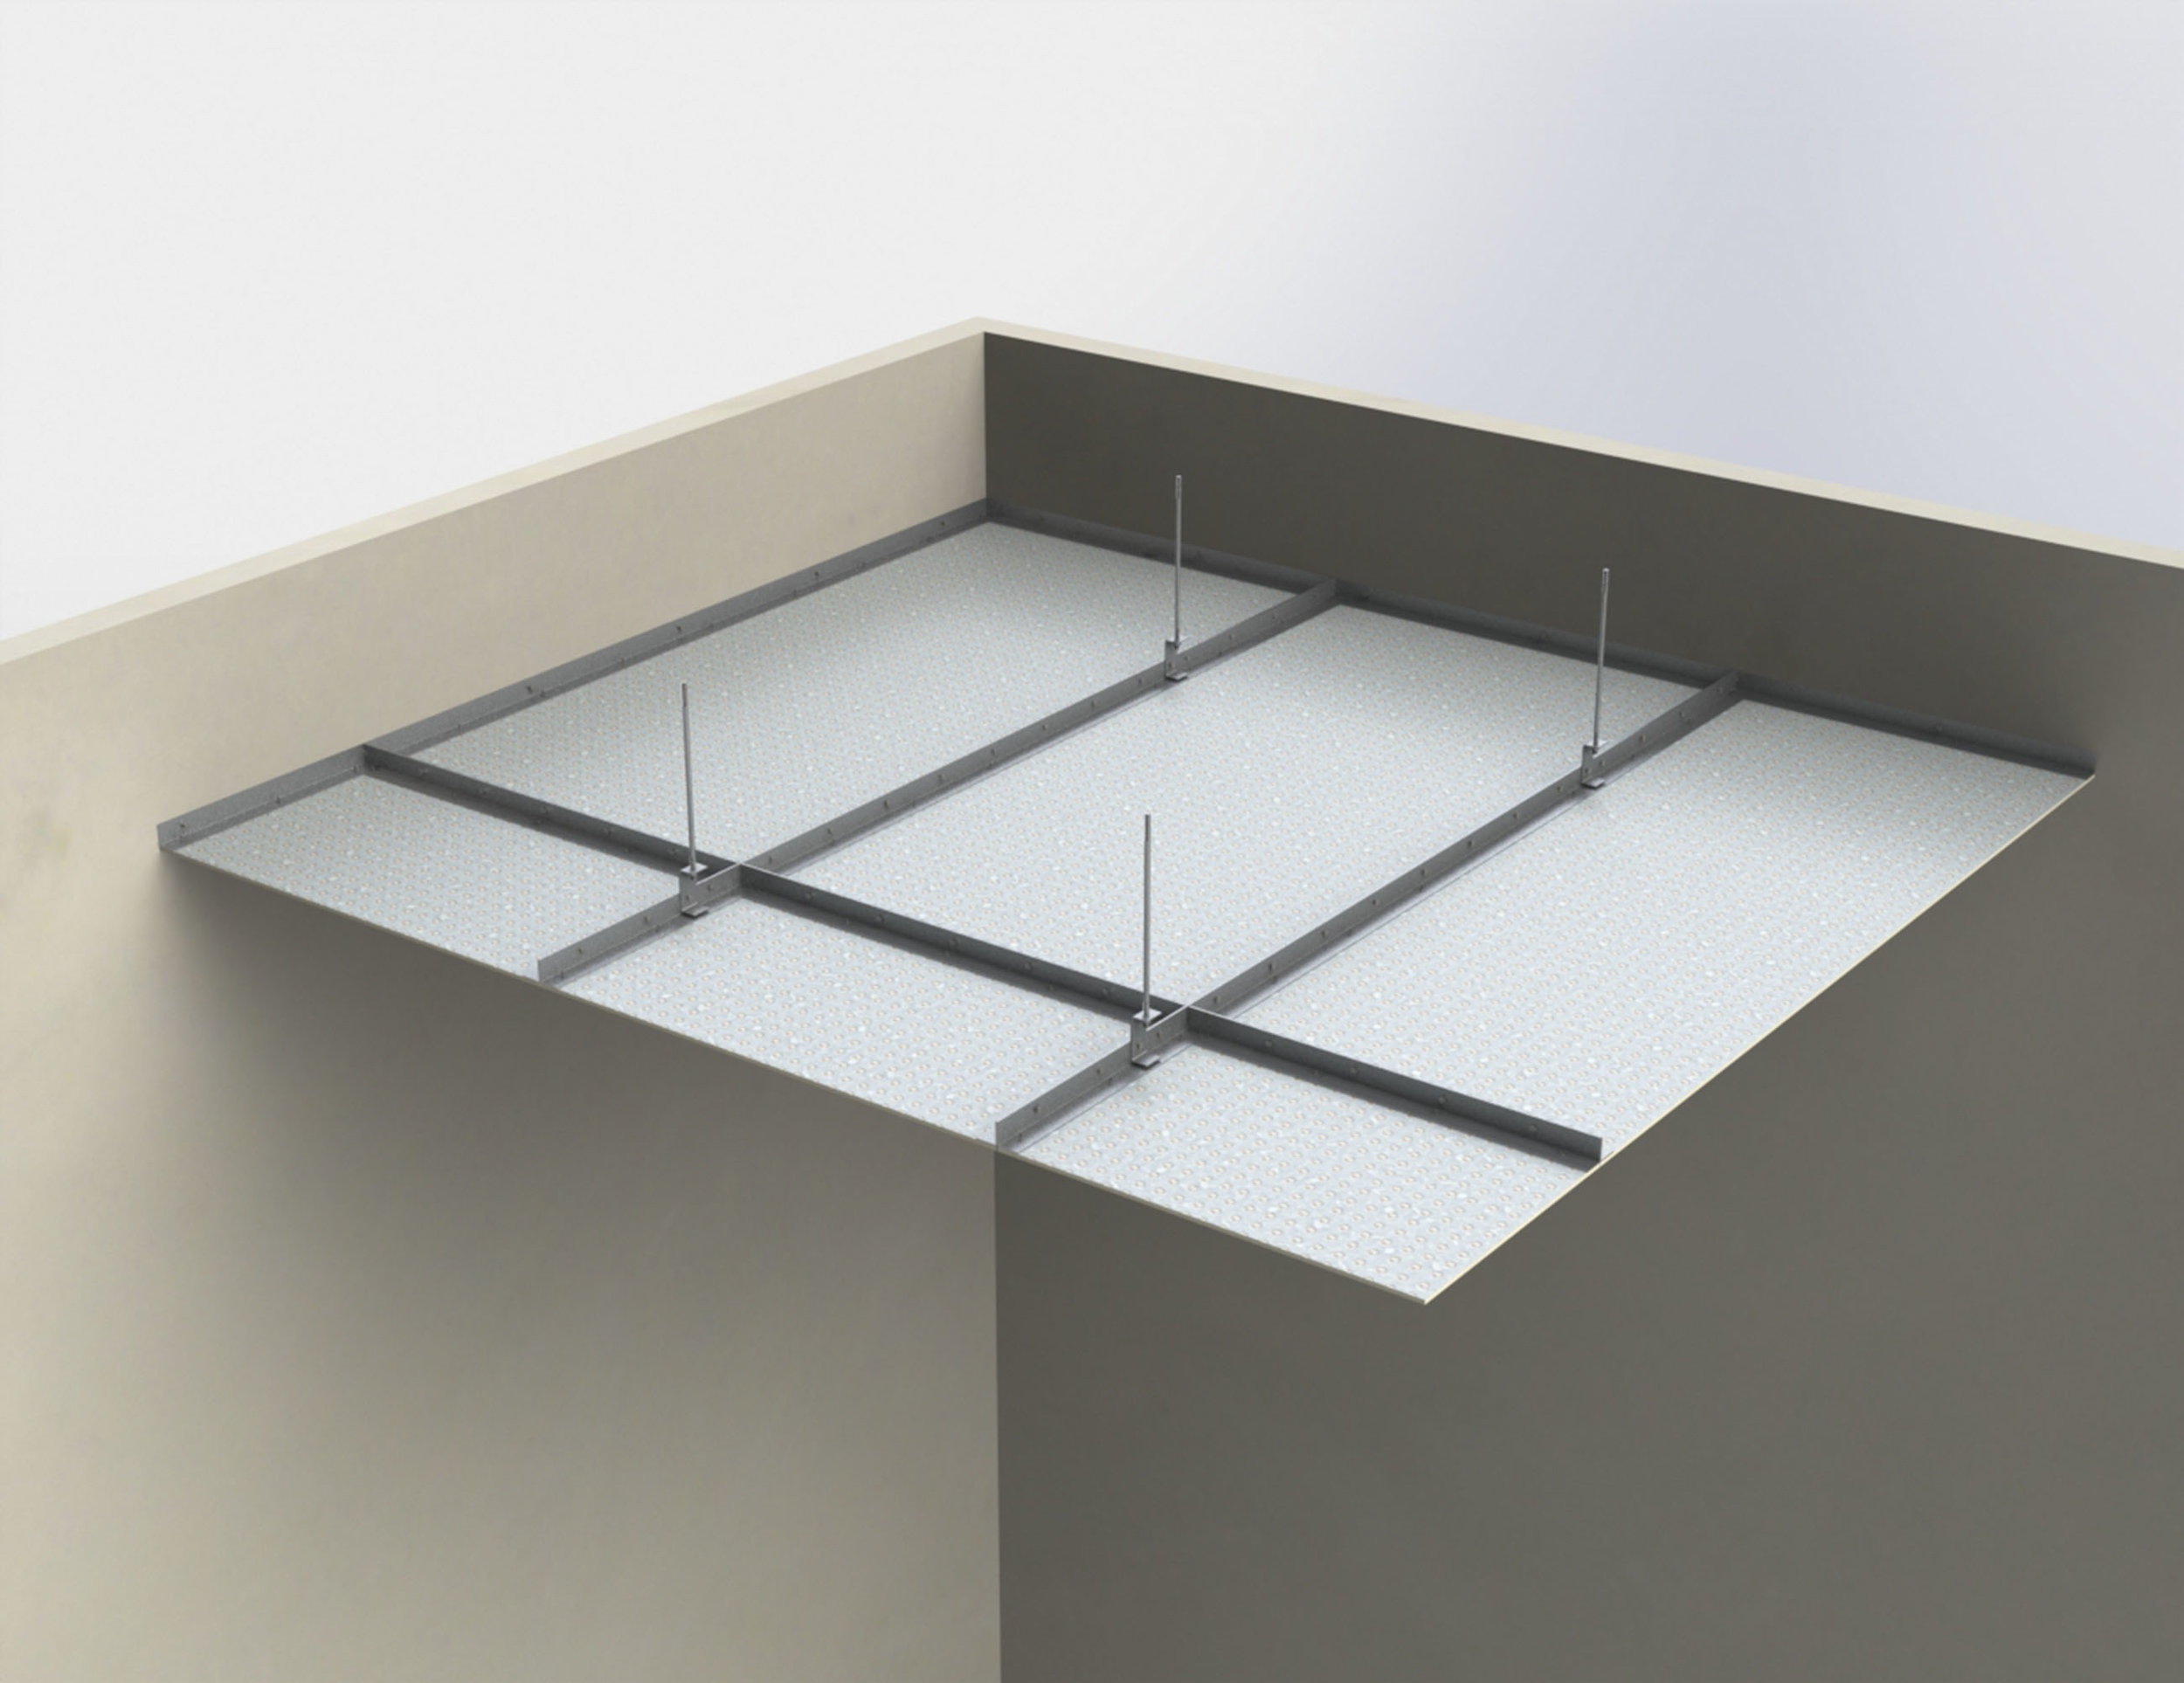 Suspended ceiling membranes (high impact resistanc   e)